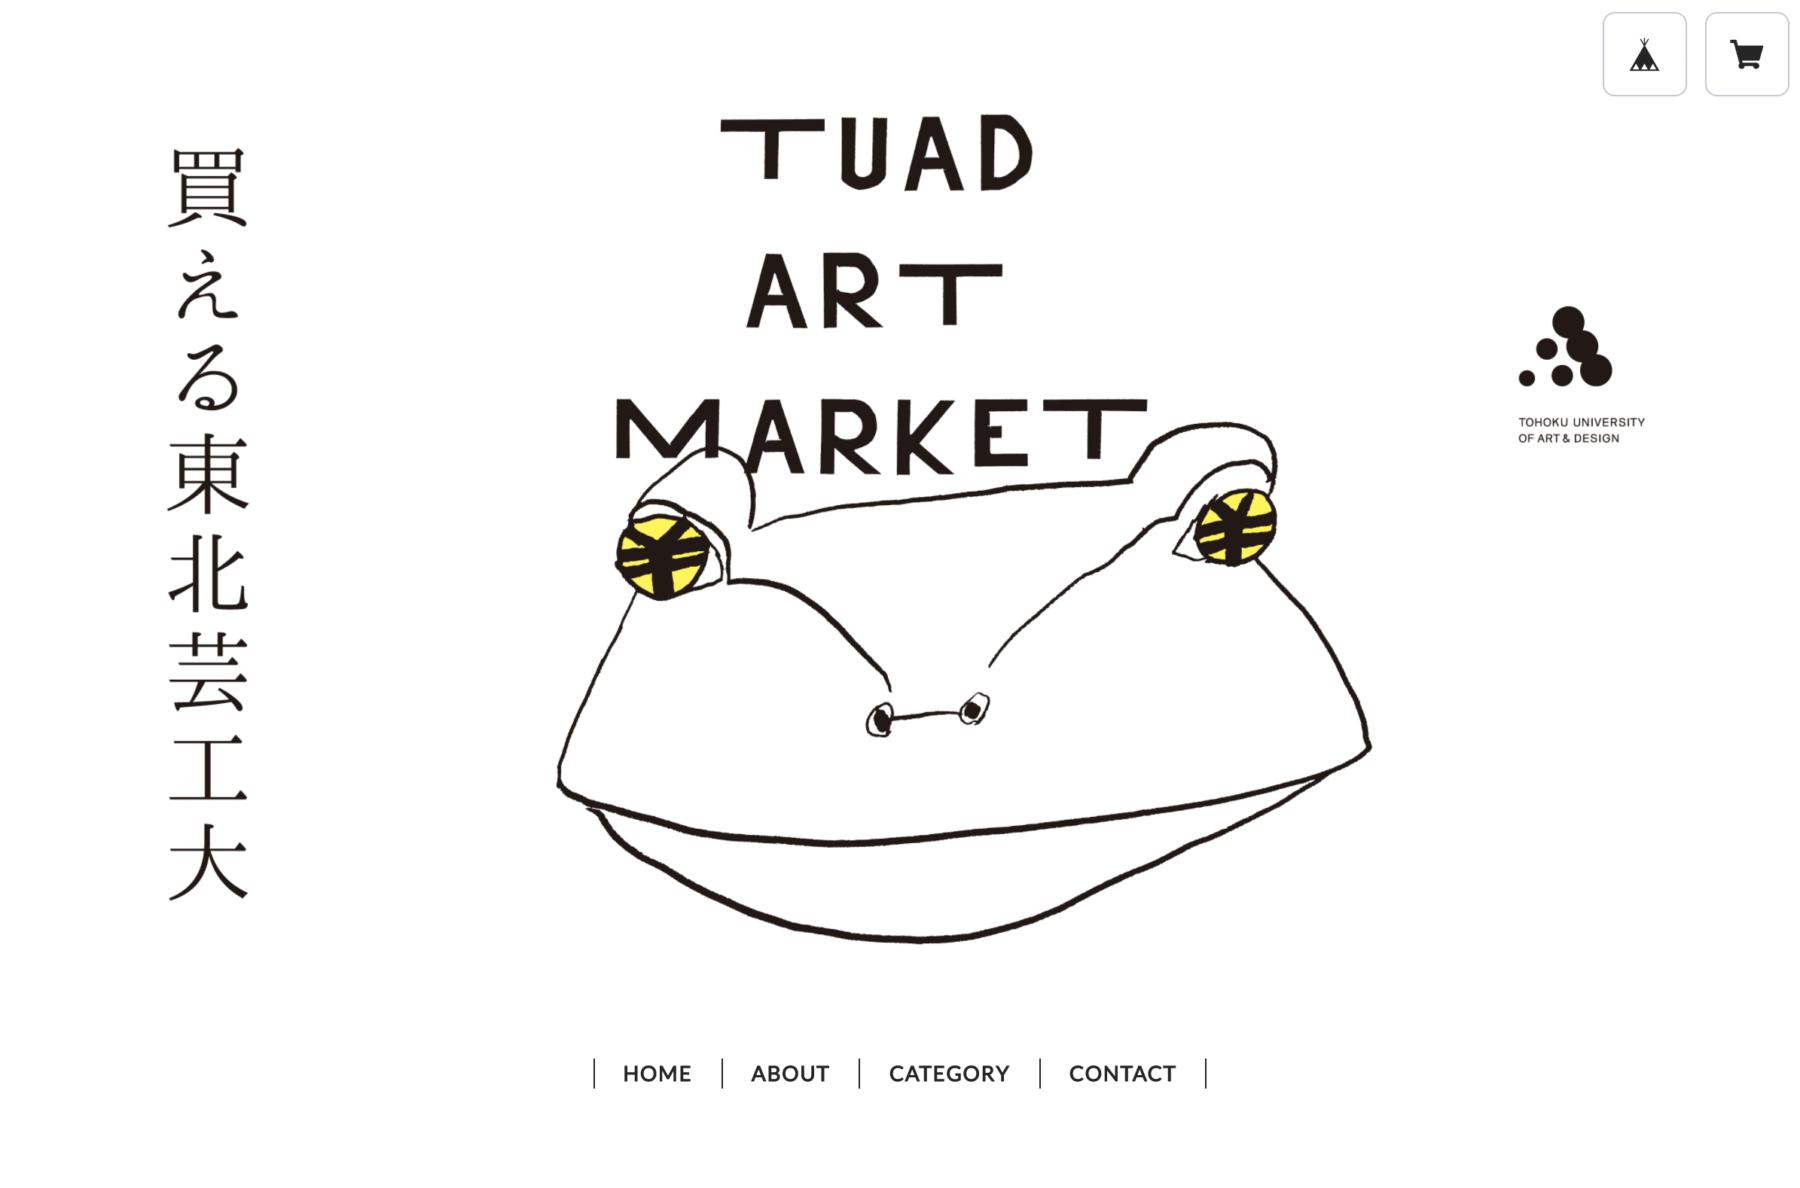 TUAD ART MARKET